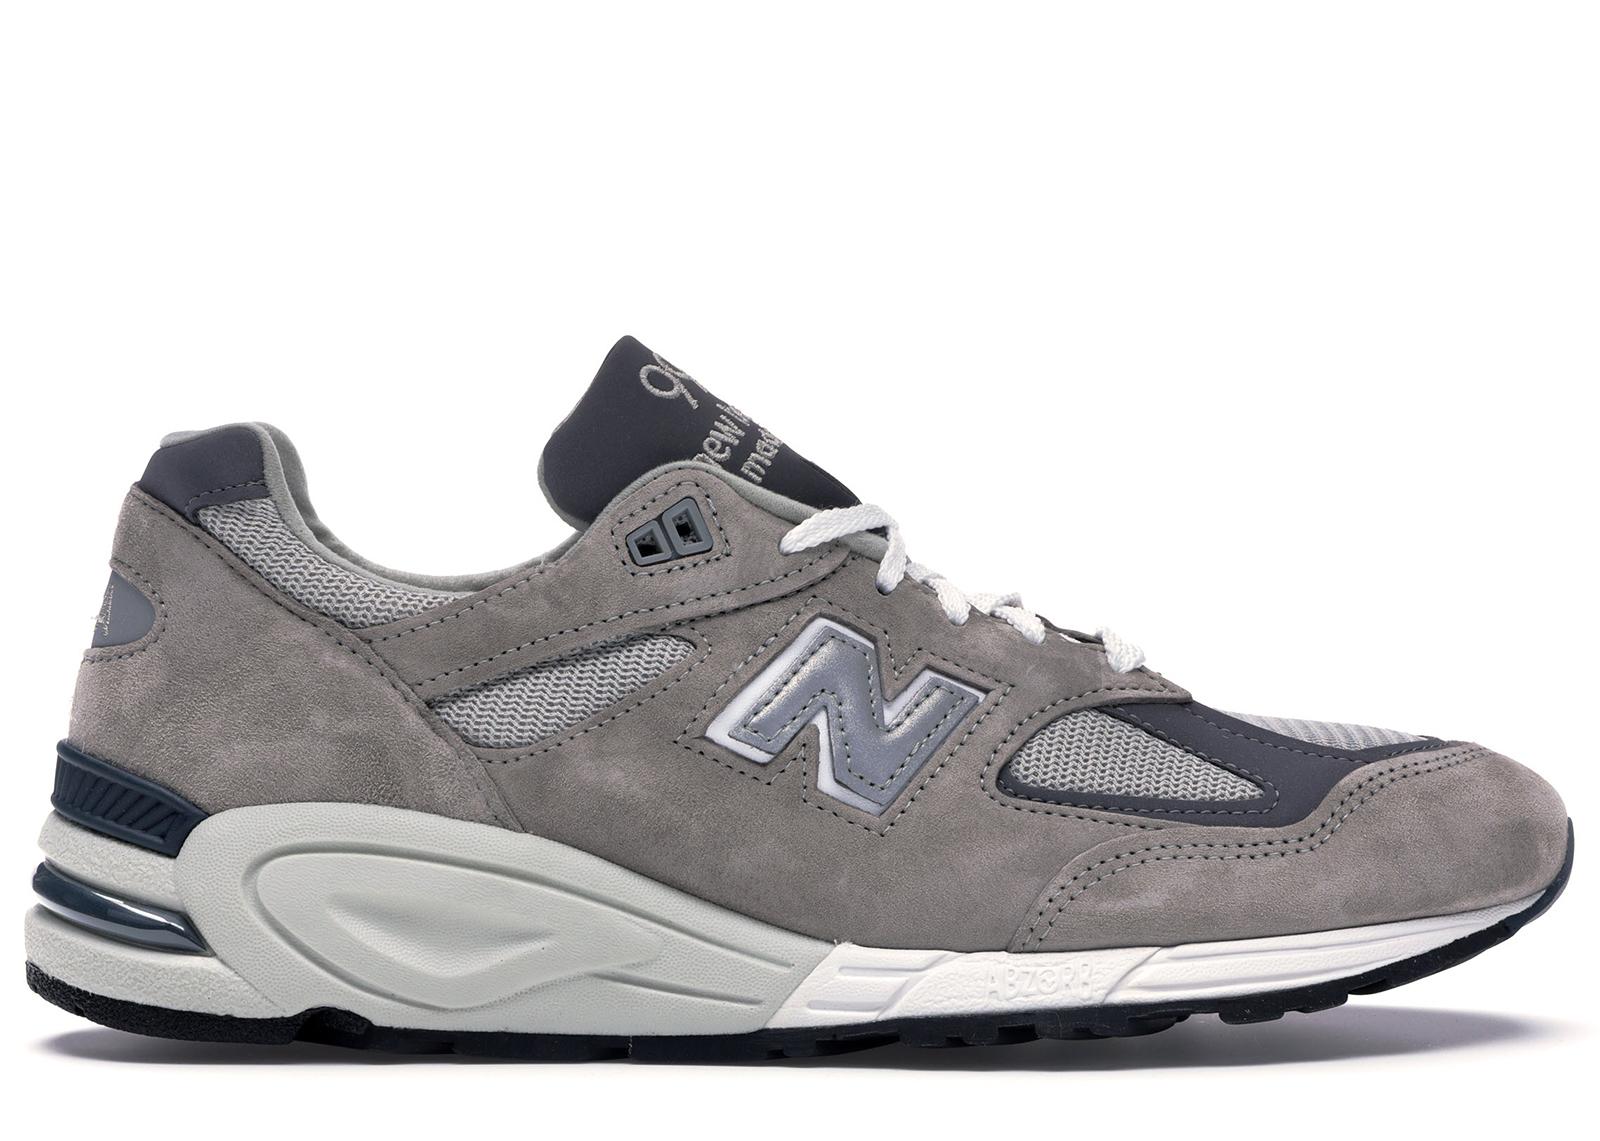 New Balance 990 V2 Kith Grey - M990GR2